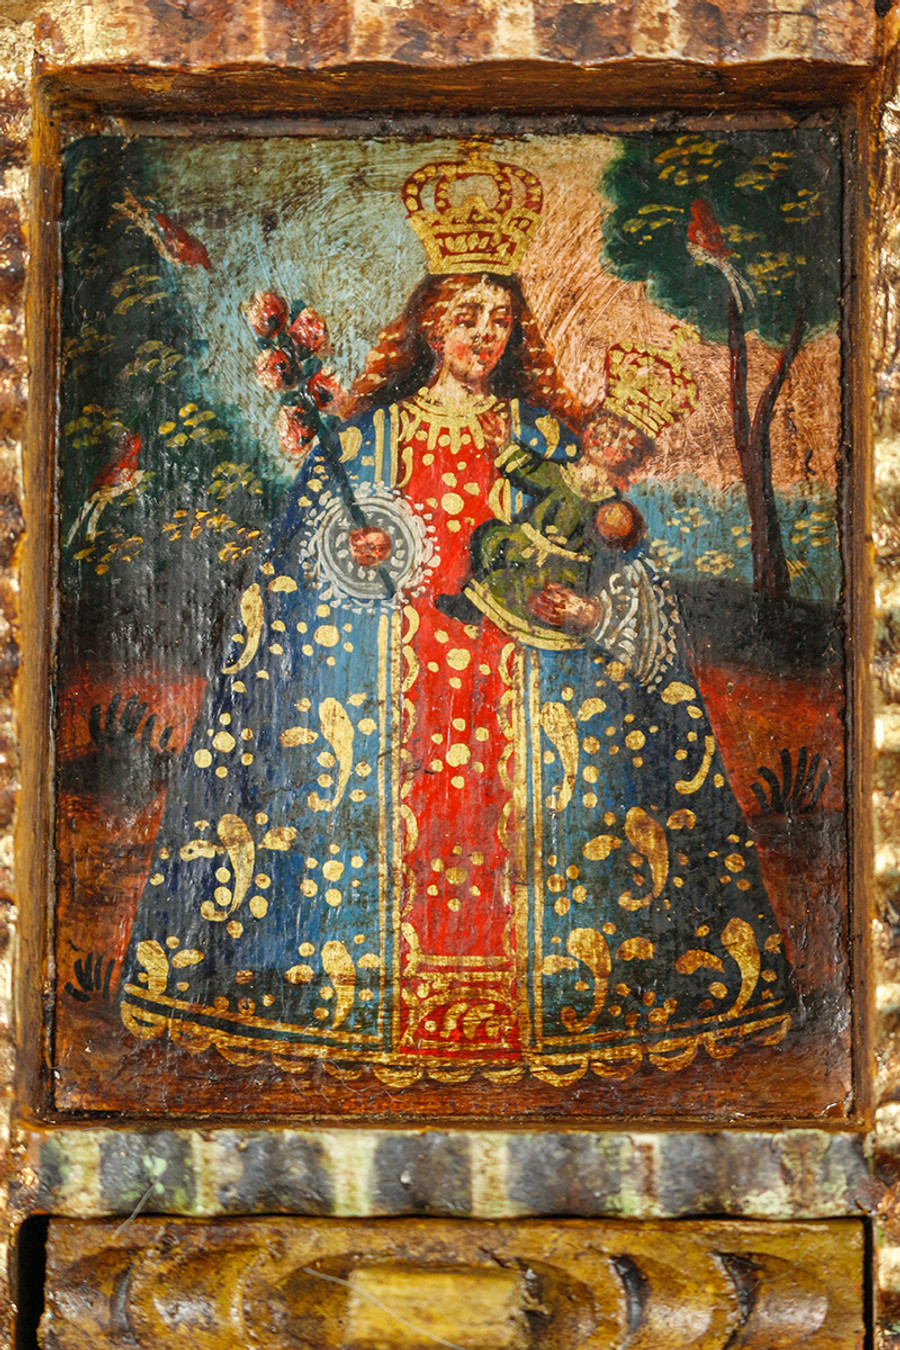 Virgin and Child Colonial Peru Art Handmade Retablo Handcarved Altarpiece (71-100-04438)